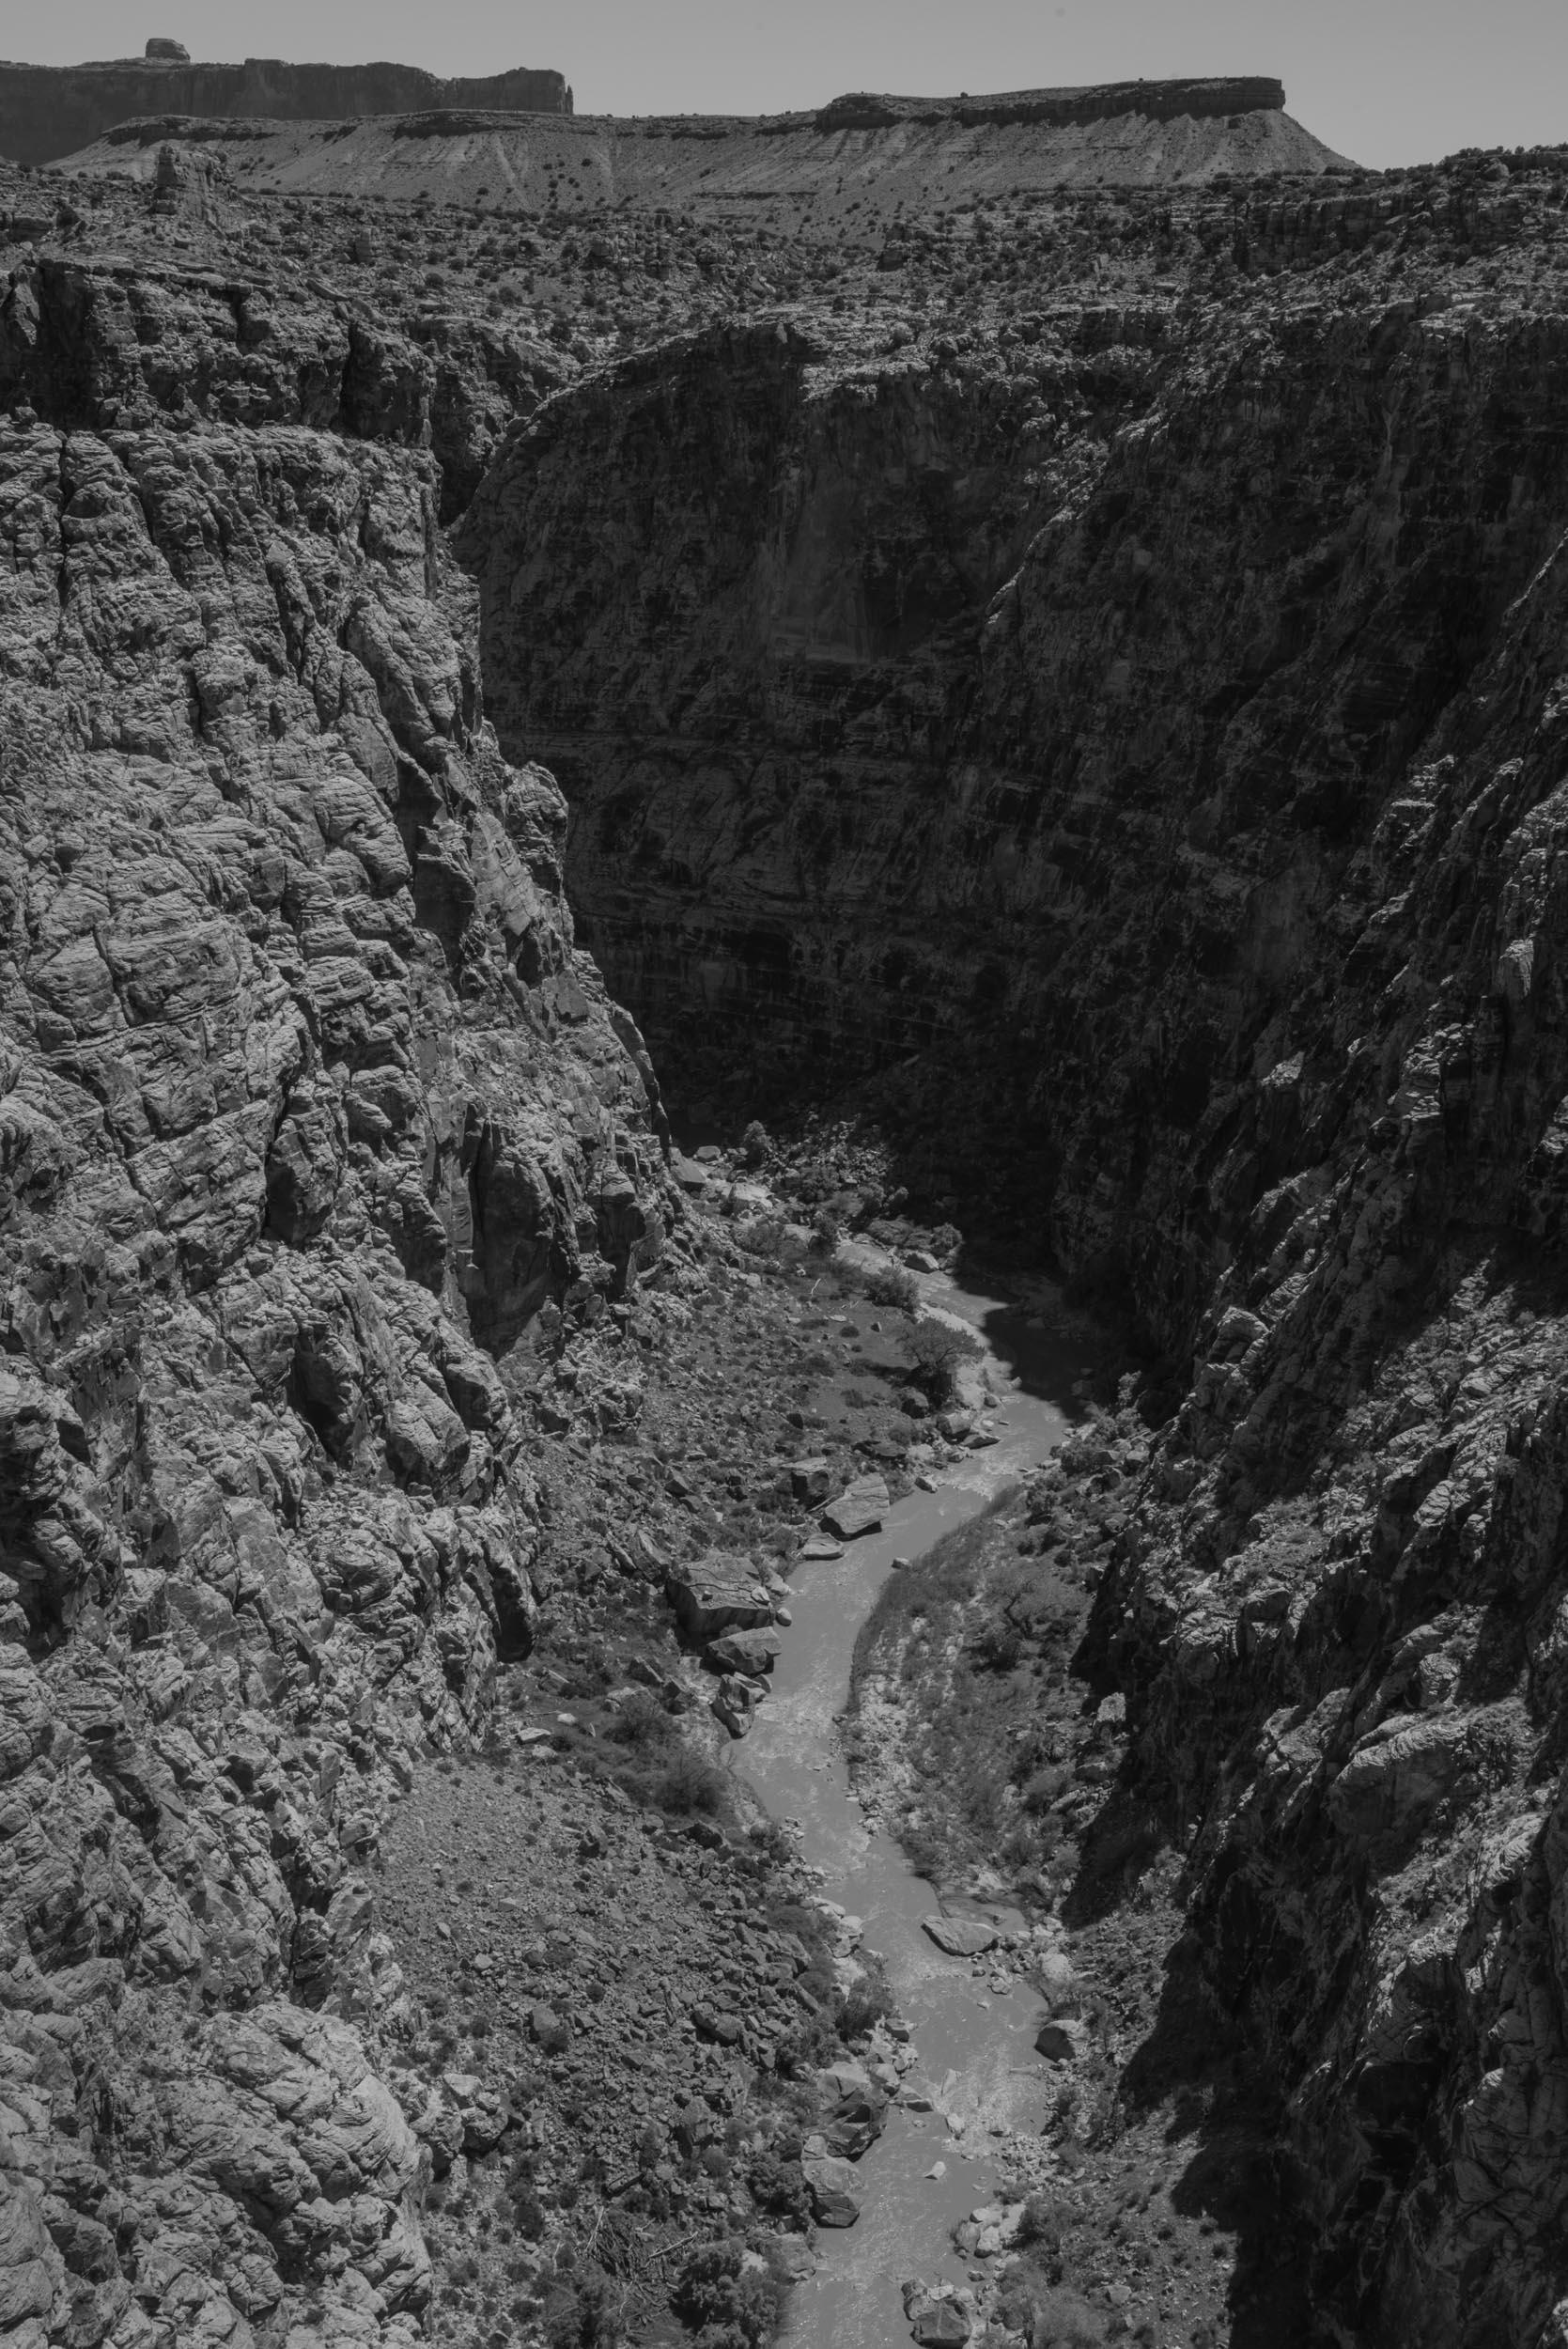 The San Rafael River has eroded the Black Box Canyon for 40 million years. San Rafael Swell, Utah.